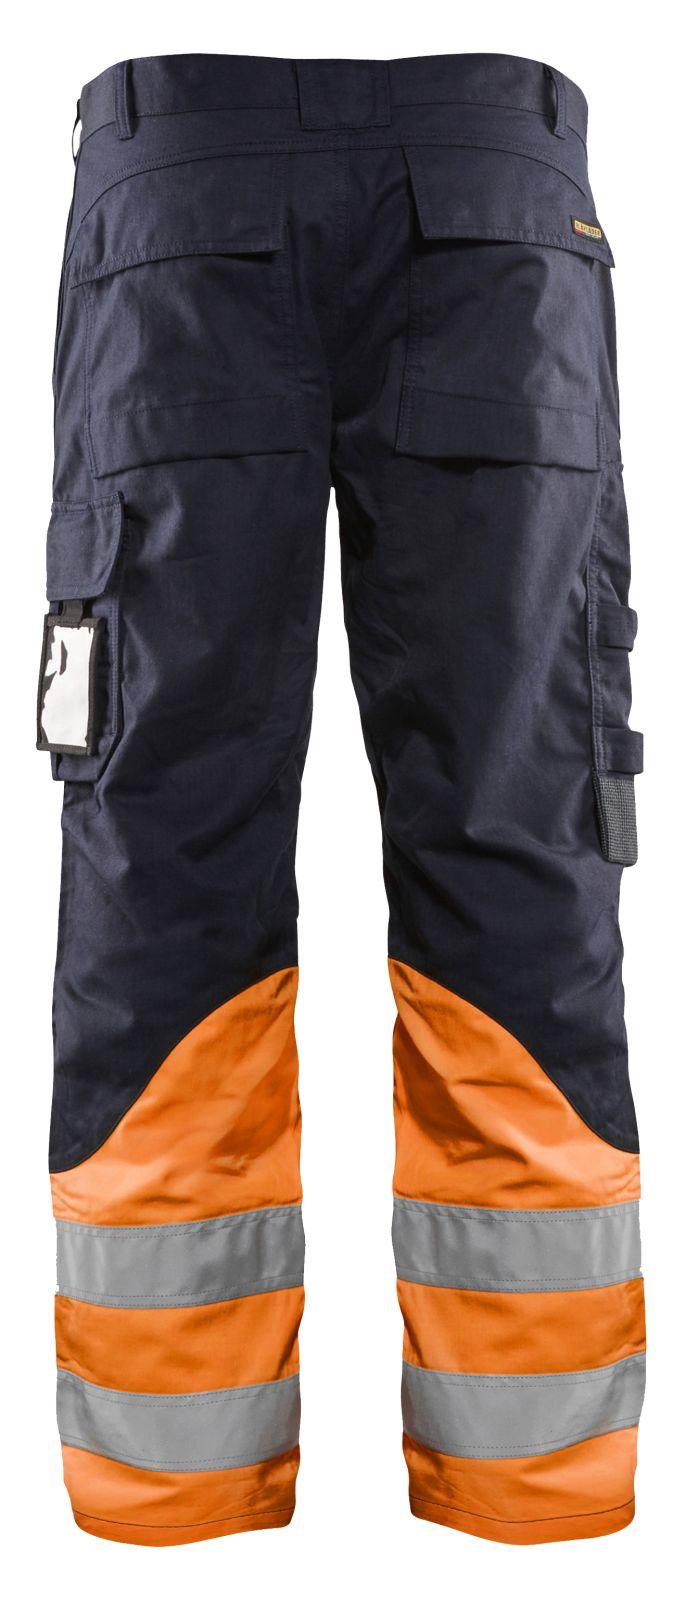 Blaklader Broeken 14881513 Multinorm marineblauw-oranje(8953)